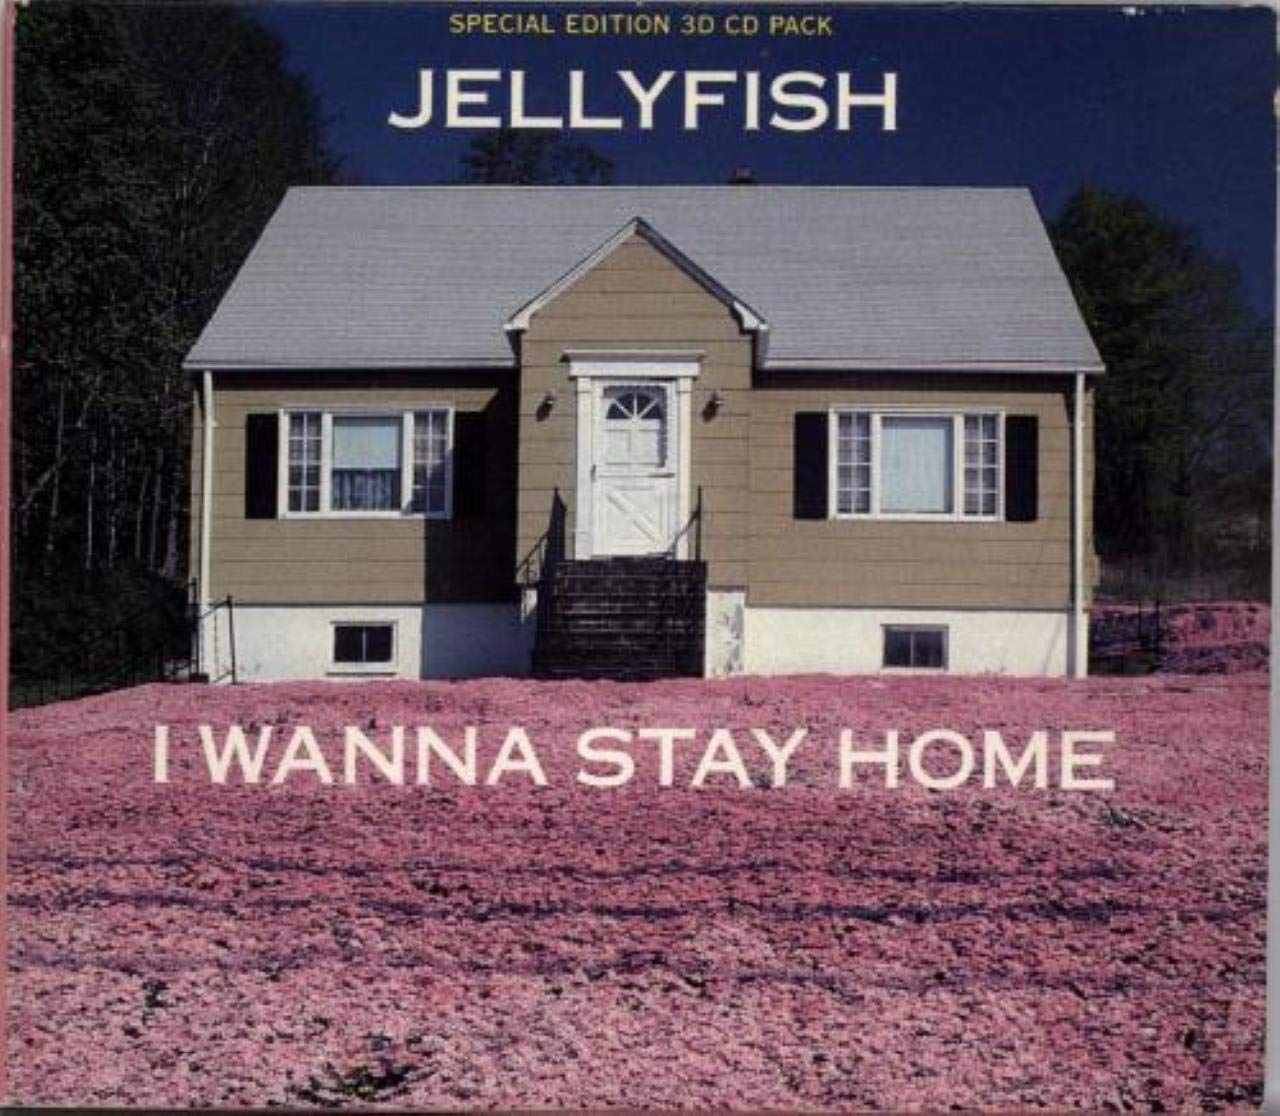 I WANNA STAY HOME CD UK CHARISMA 1991